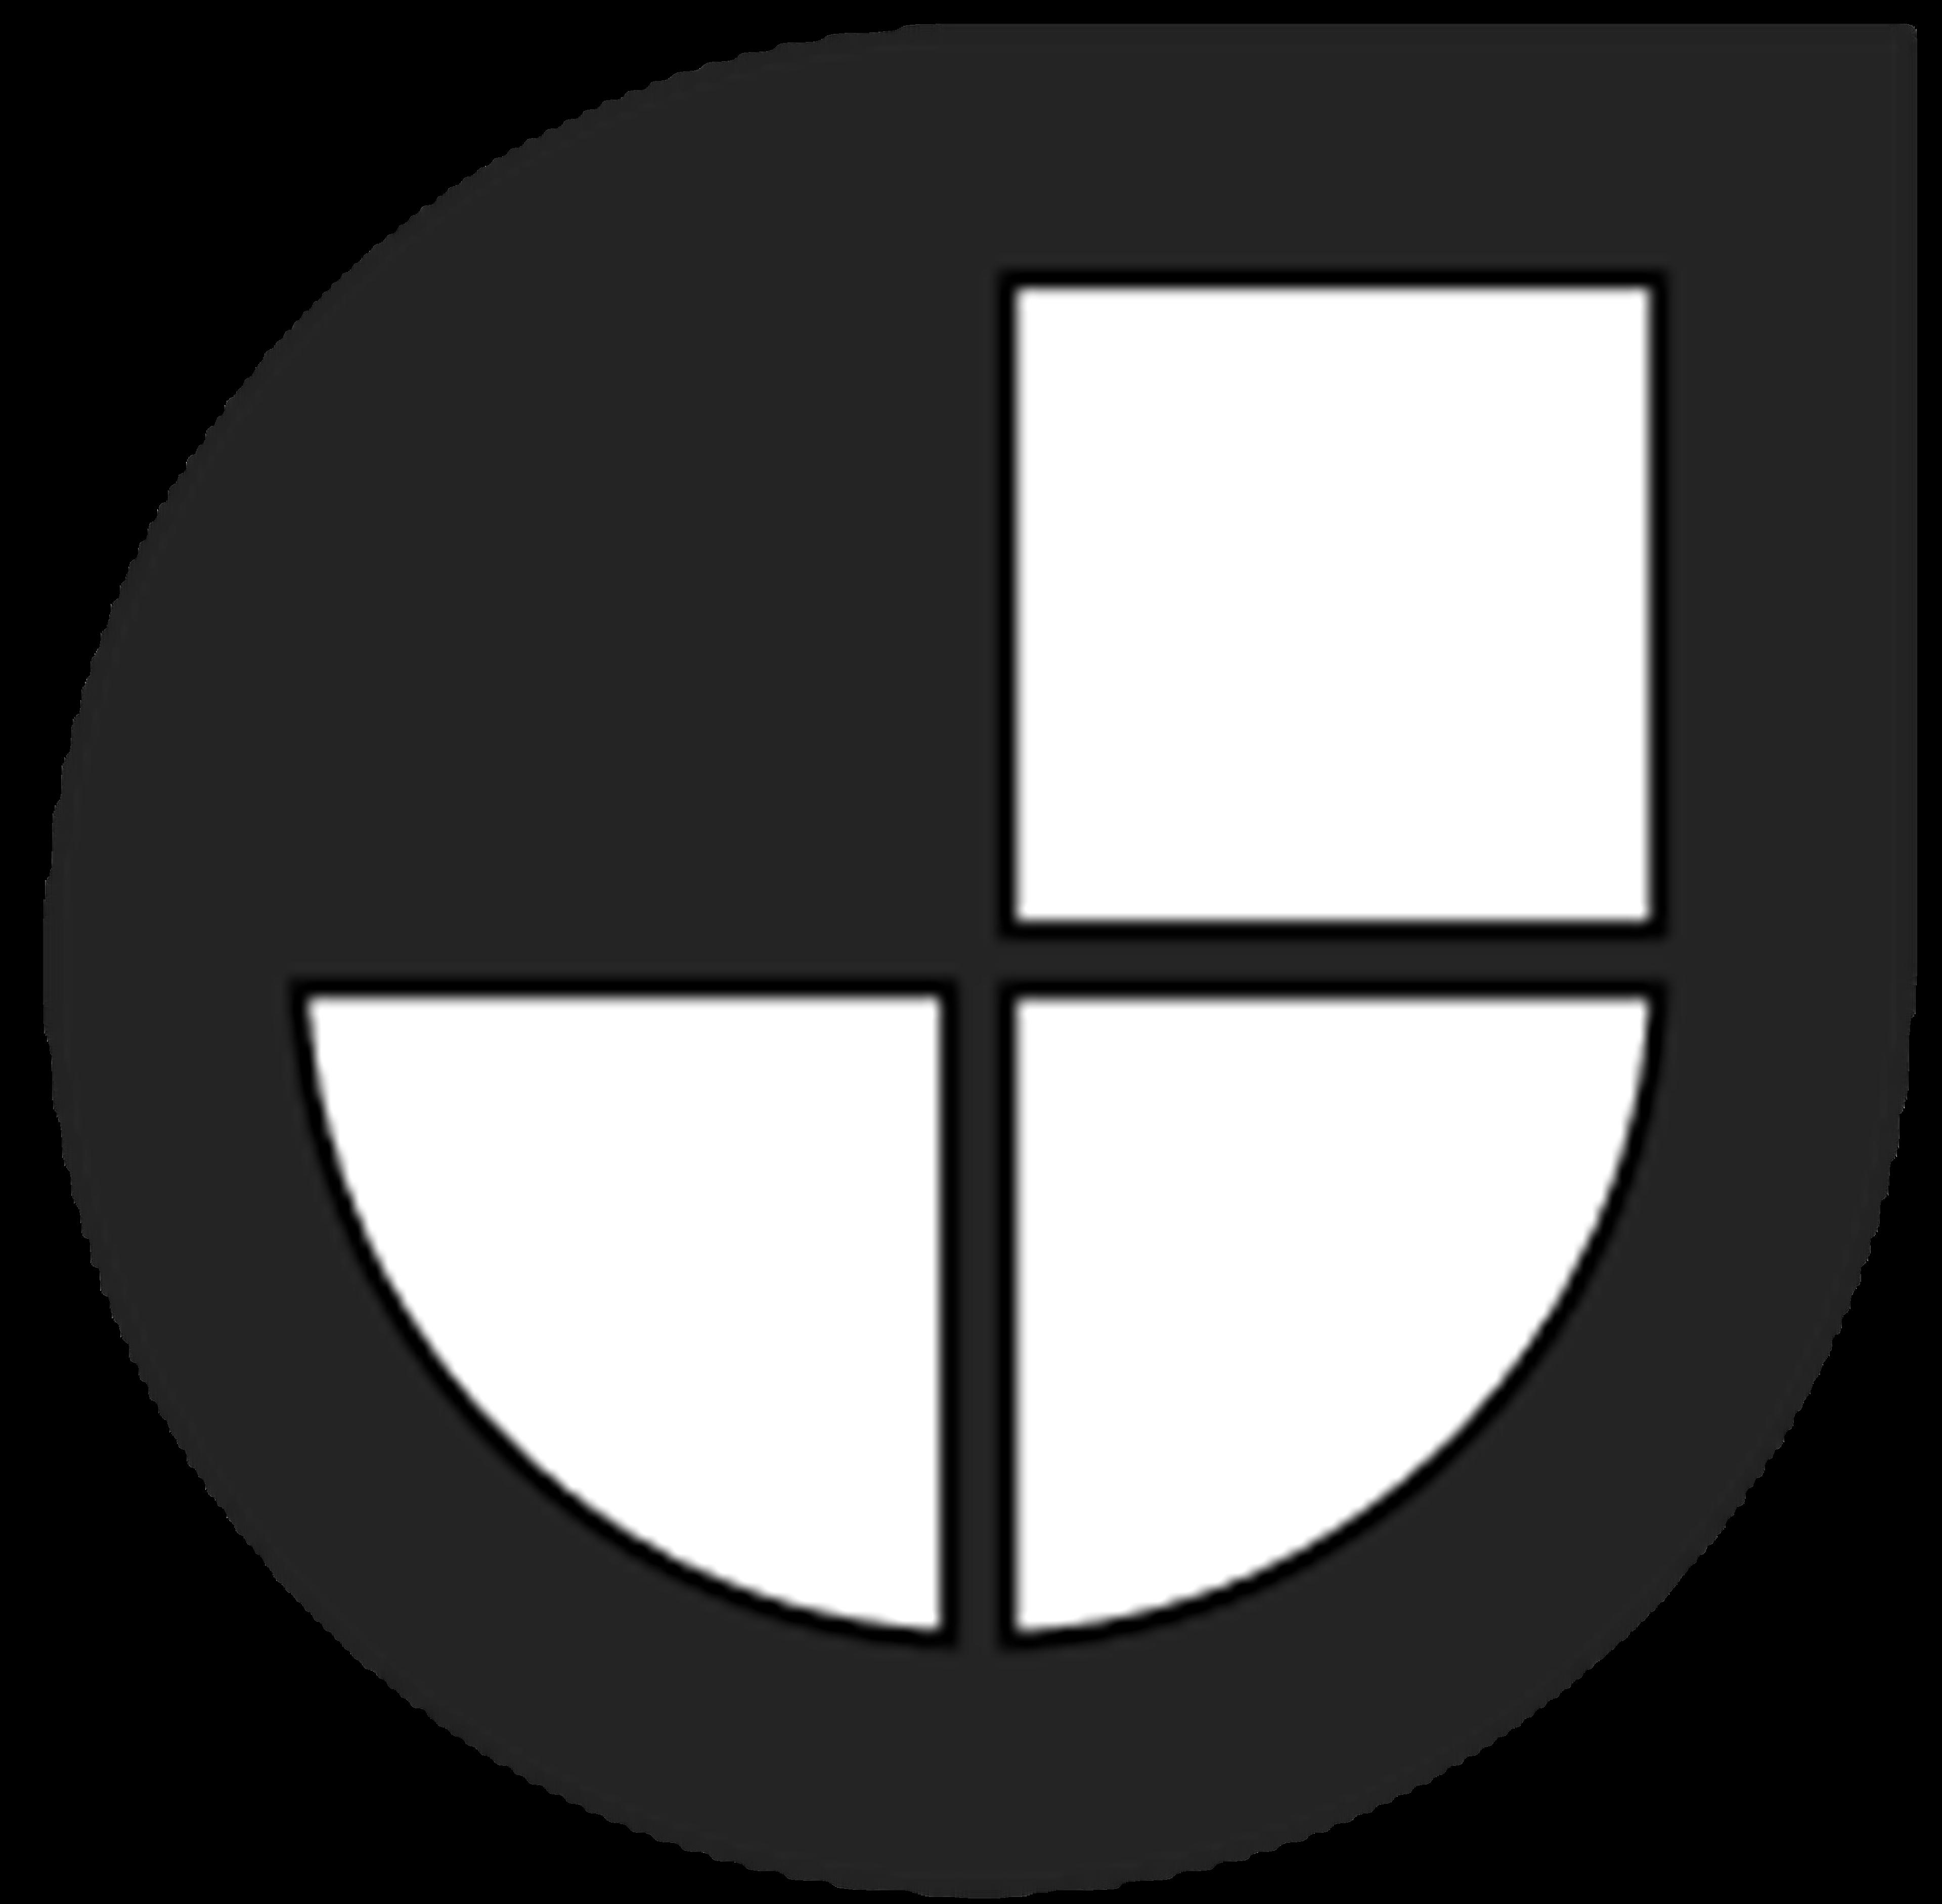 Jamstack icon